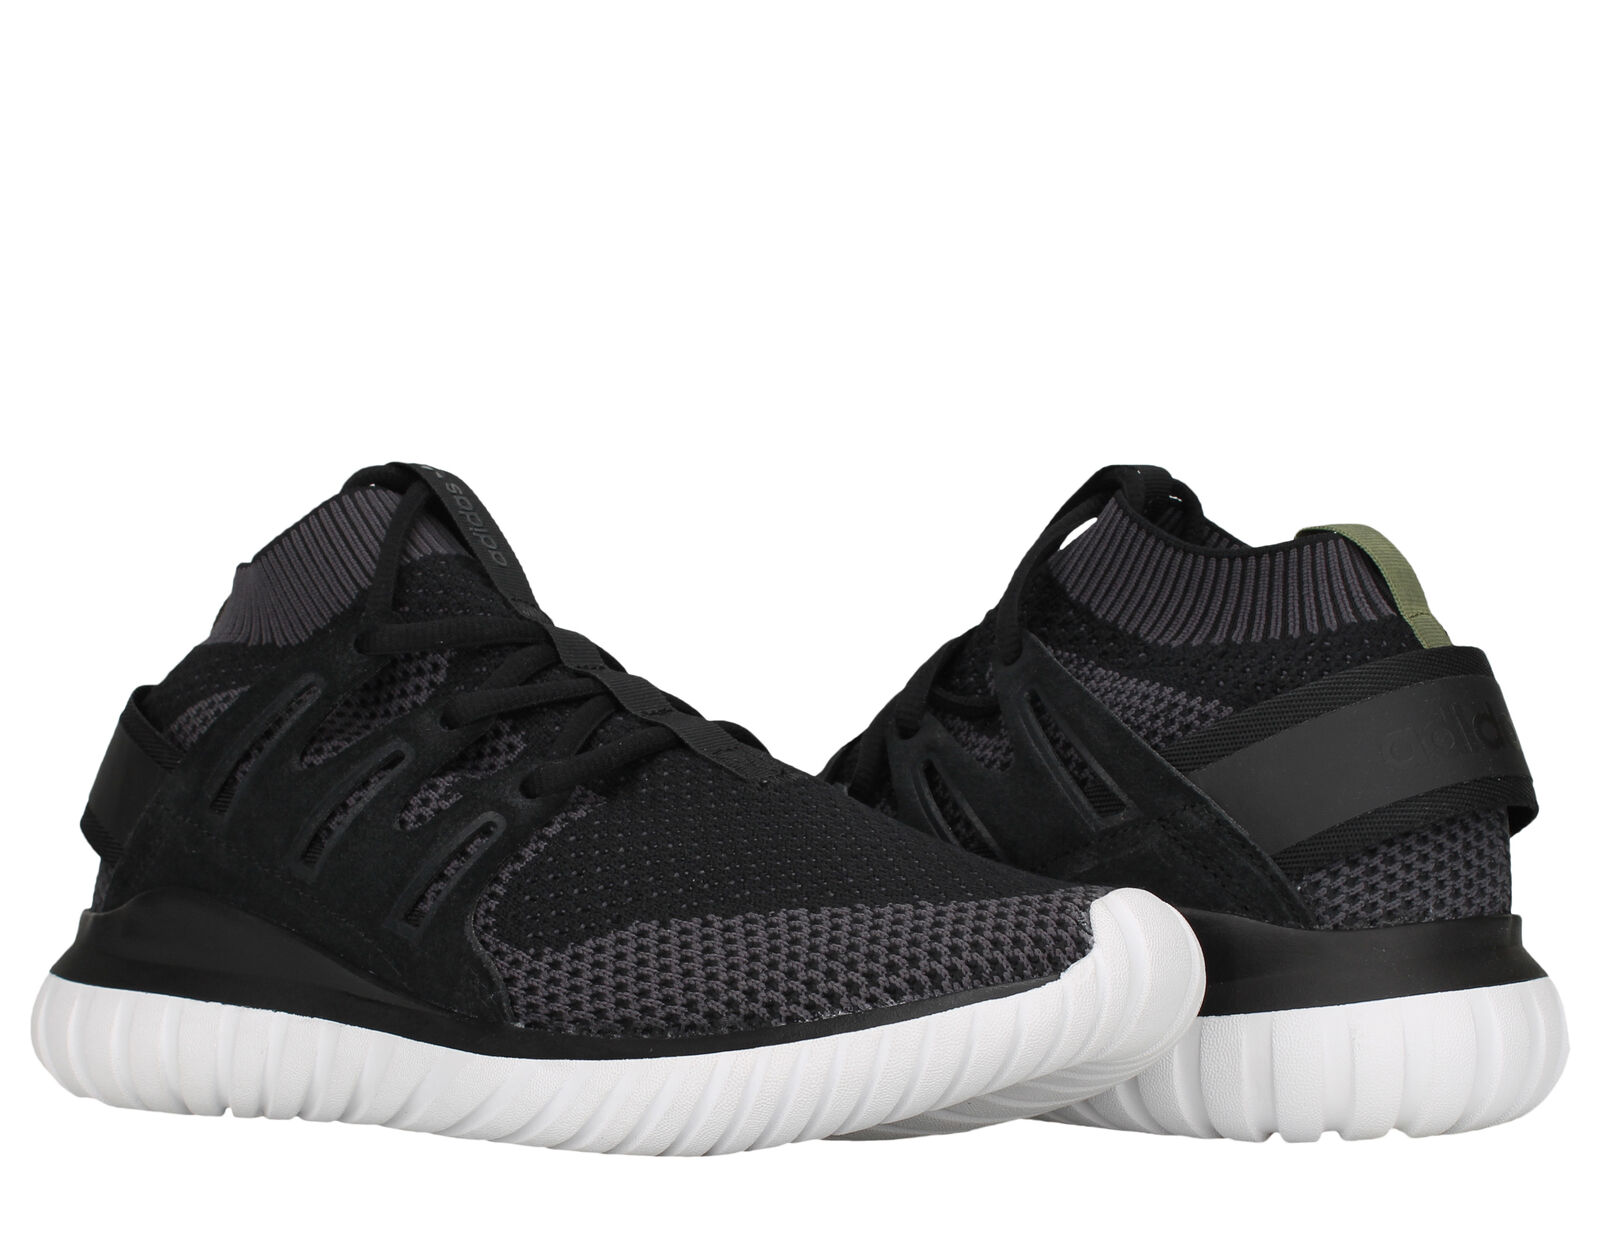 Adidas Tubular Nova PK Primeknit Black/White Men's Running Shoes S74917